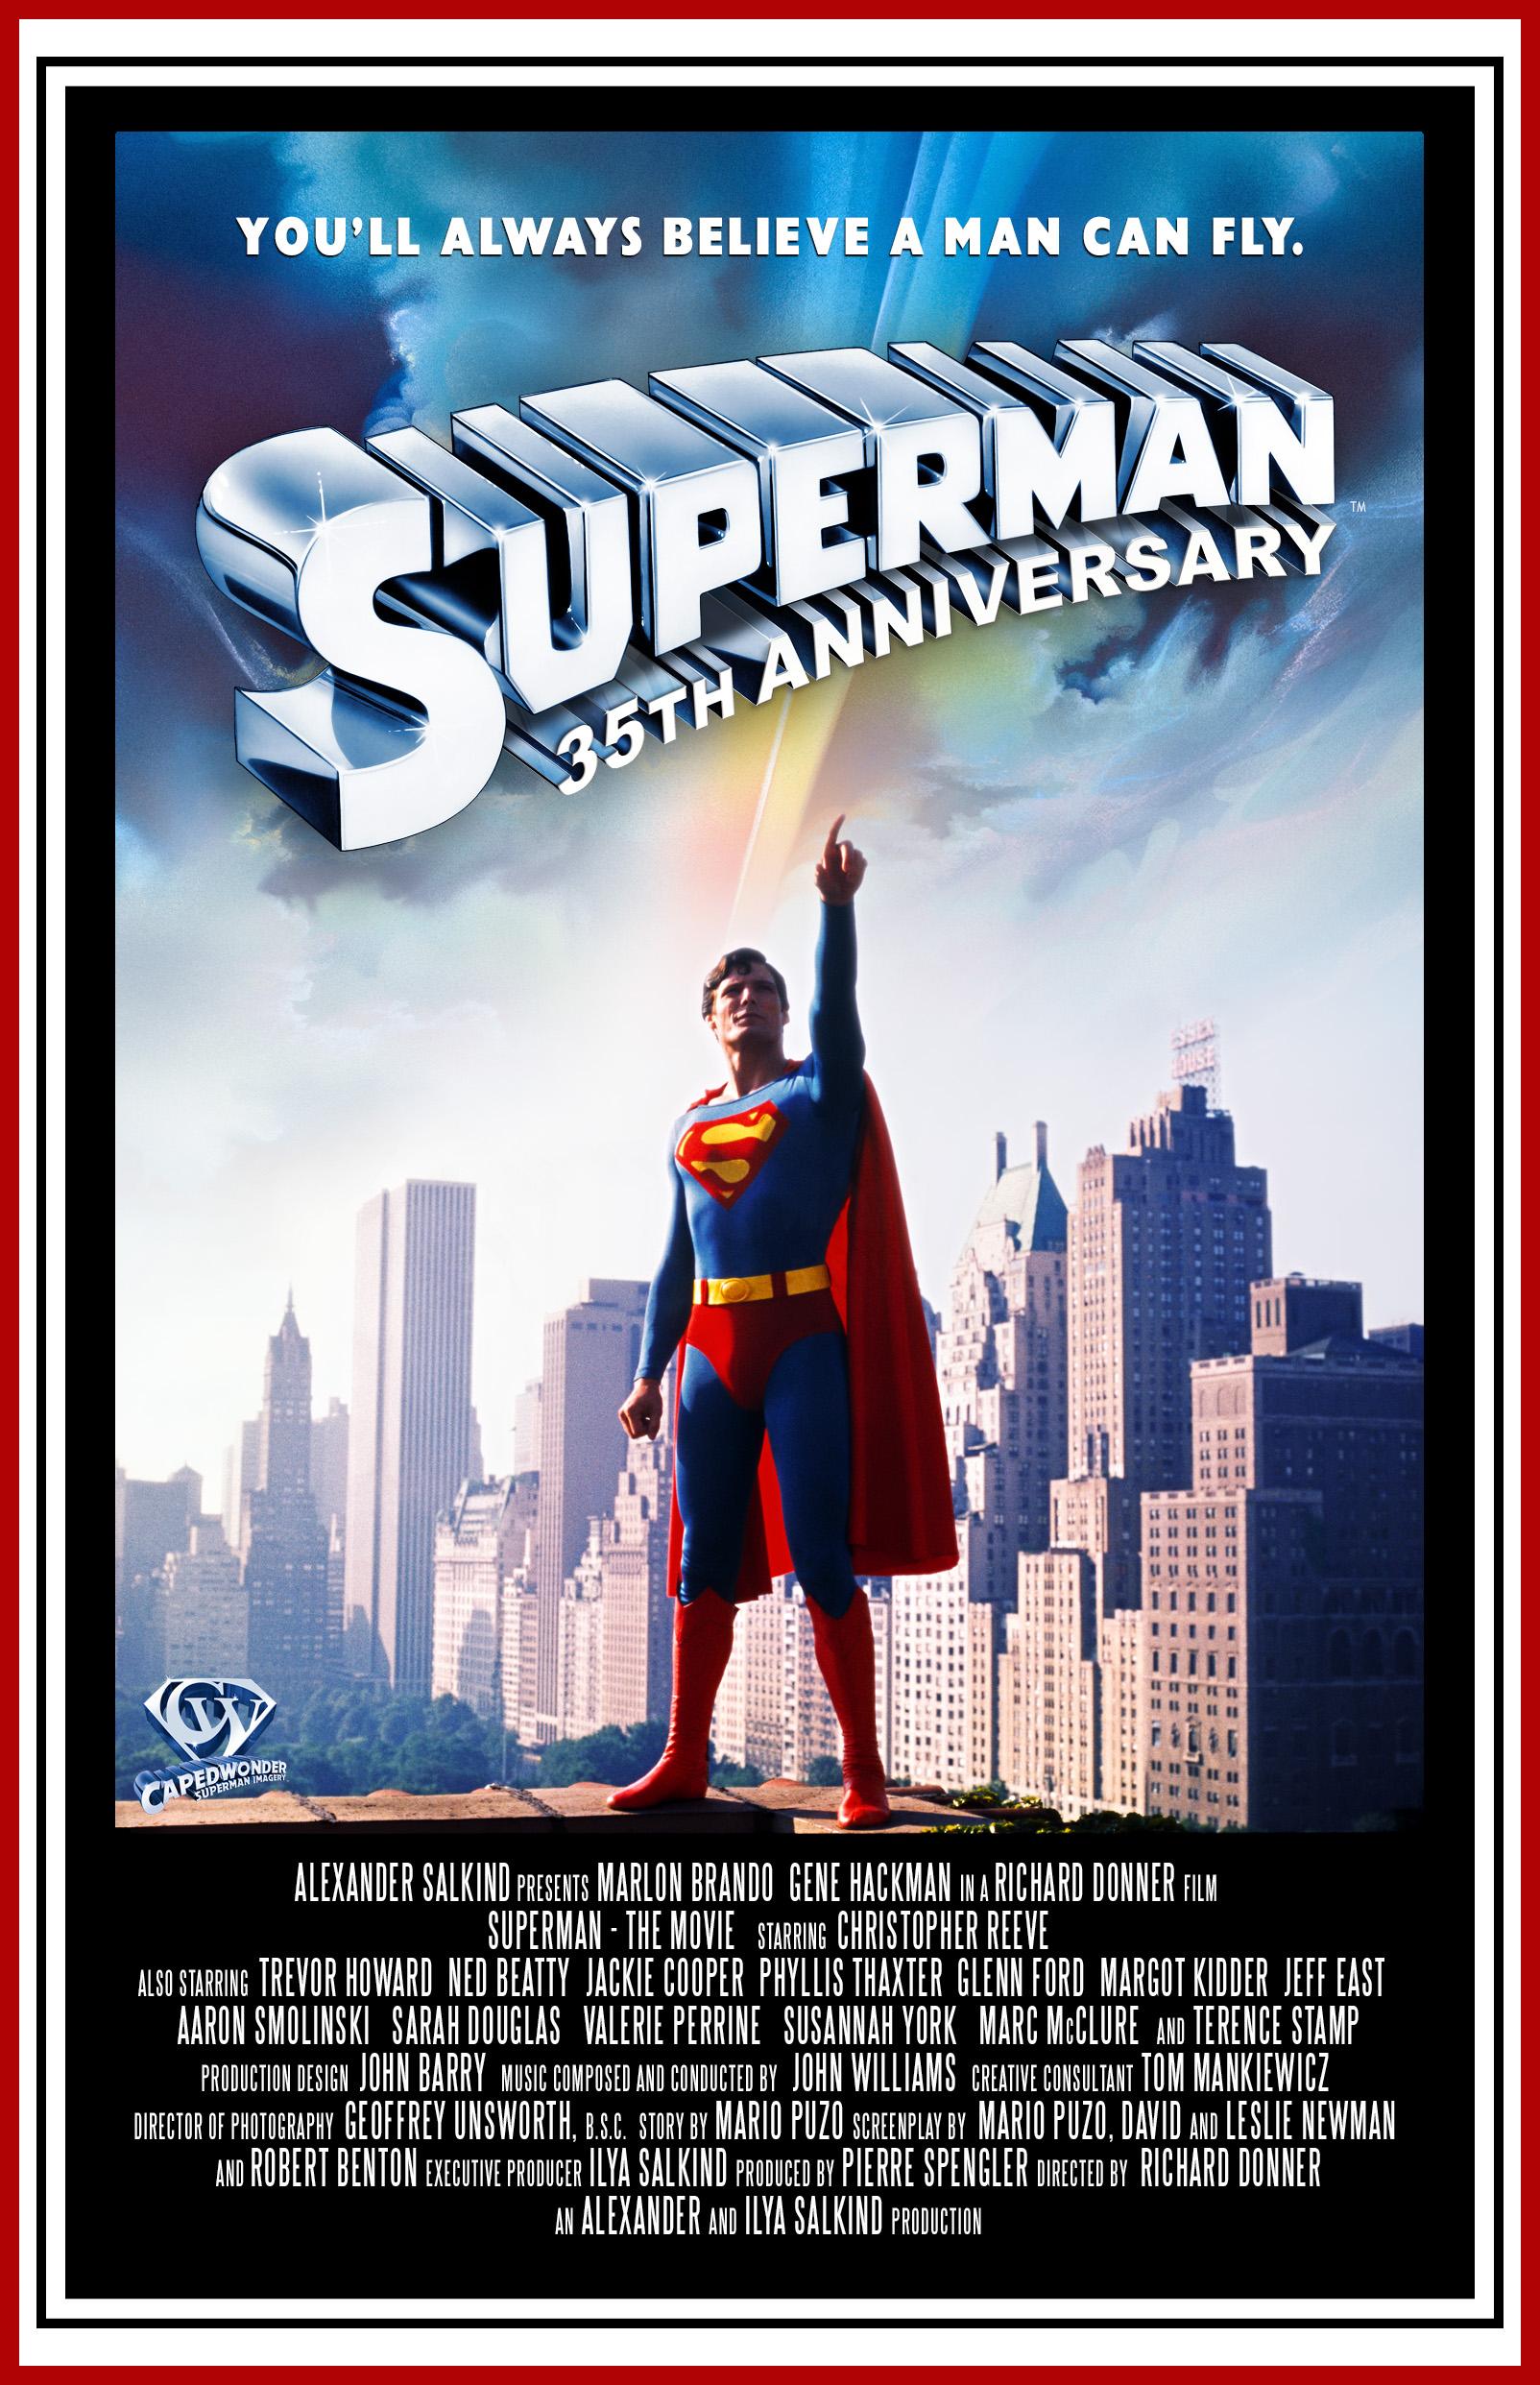 CapedWonder-Superman-The-Movie-35-poster.jpg